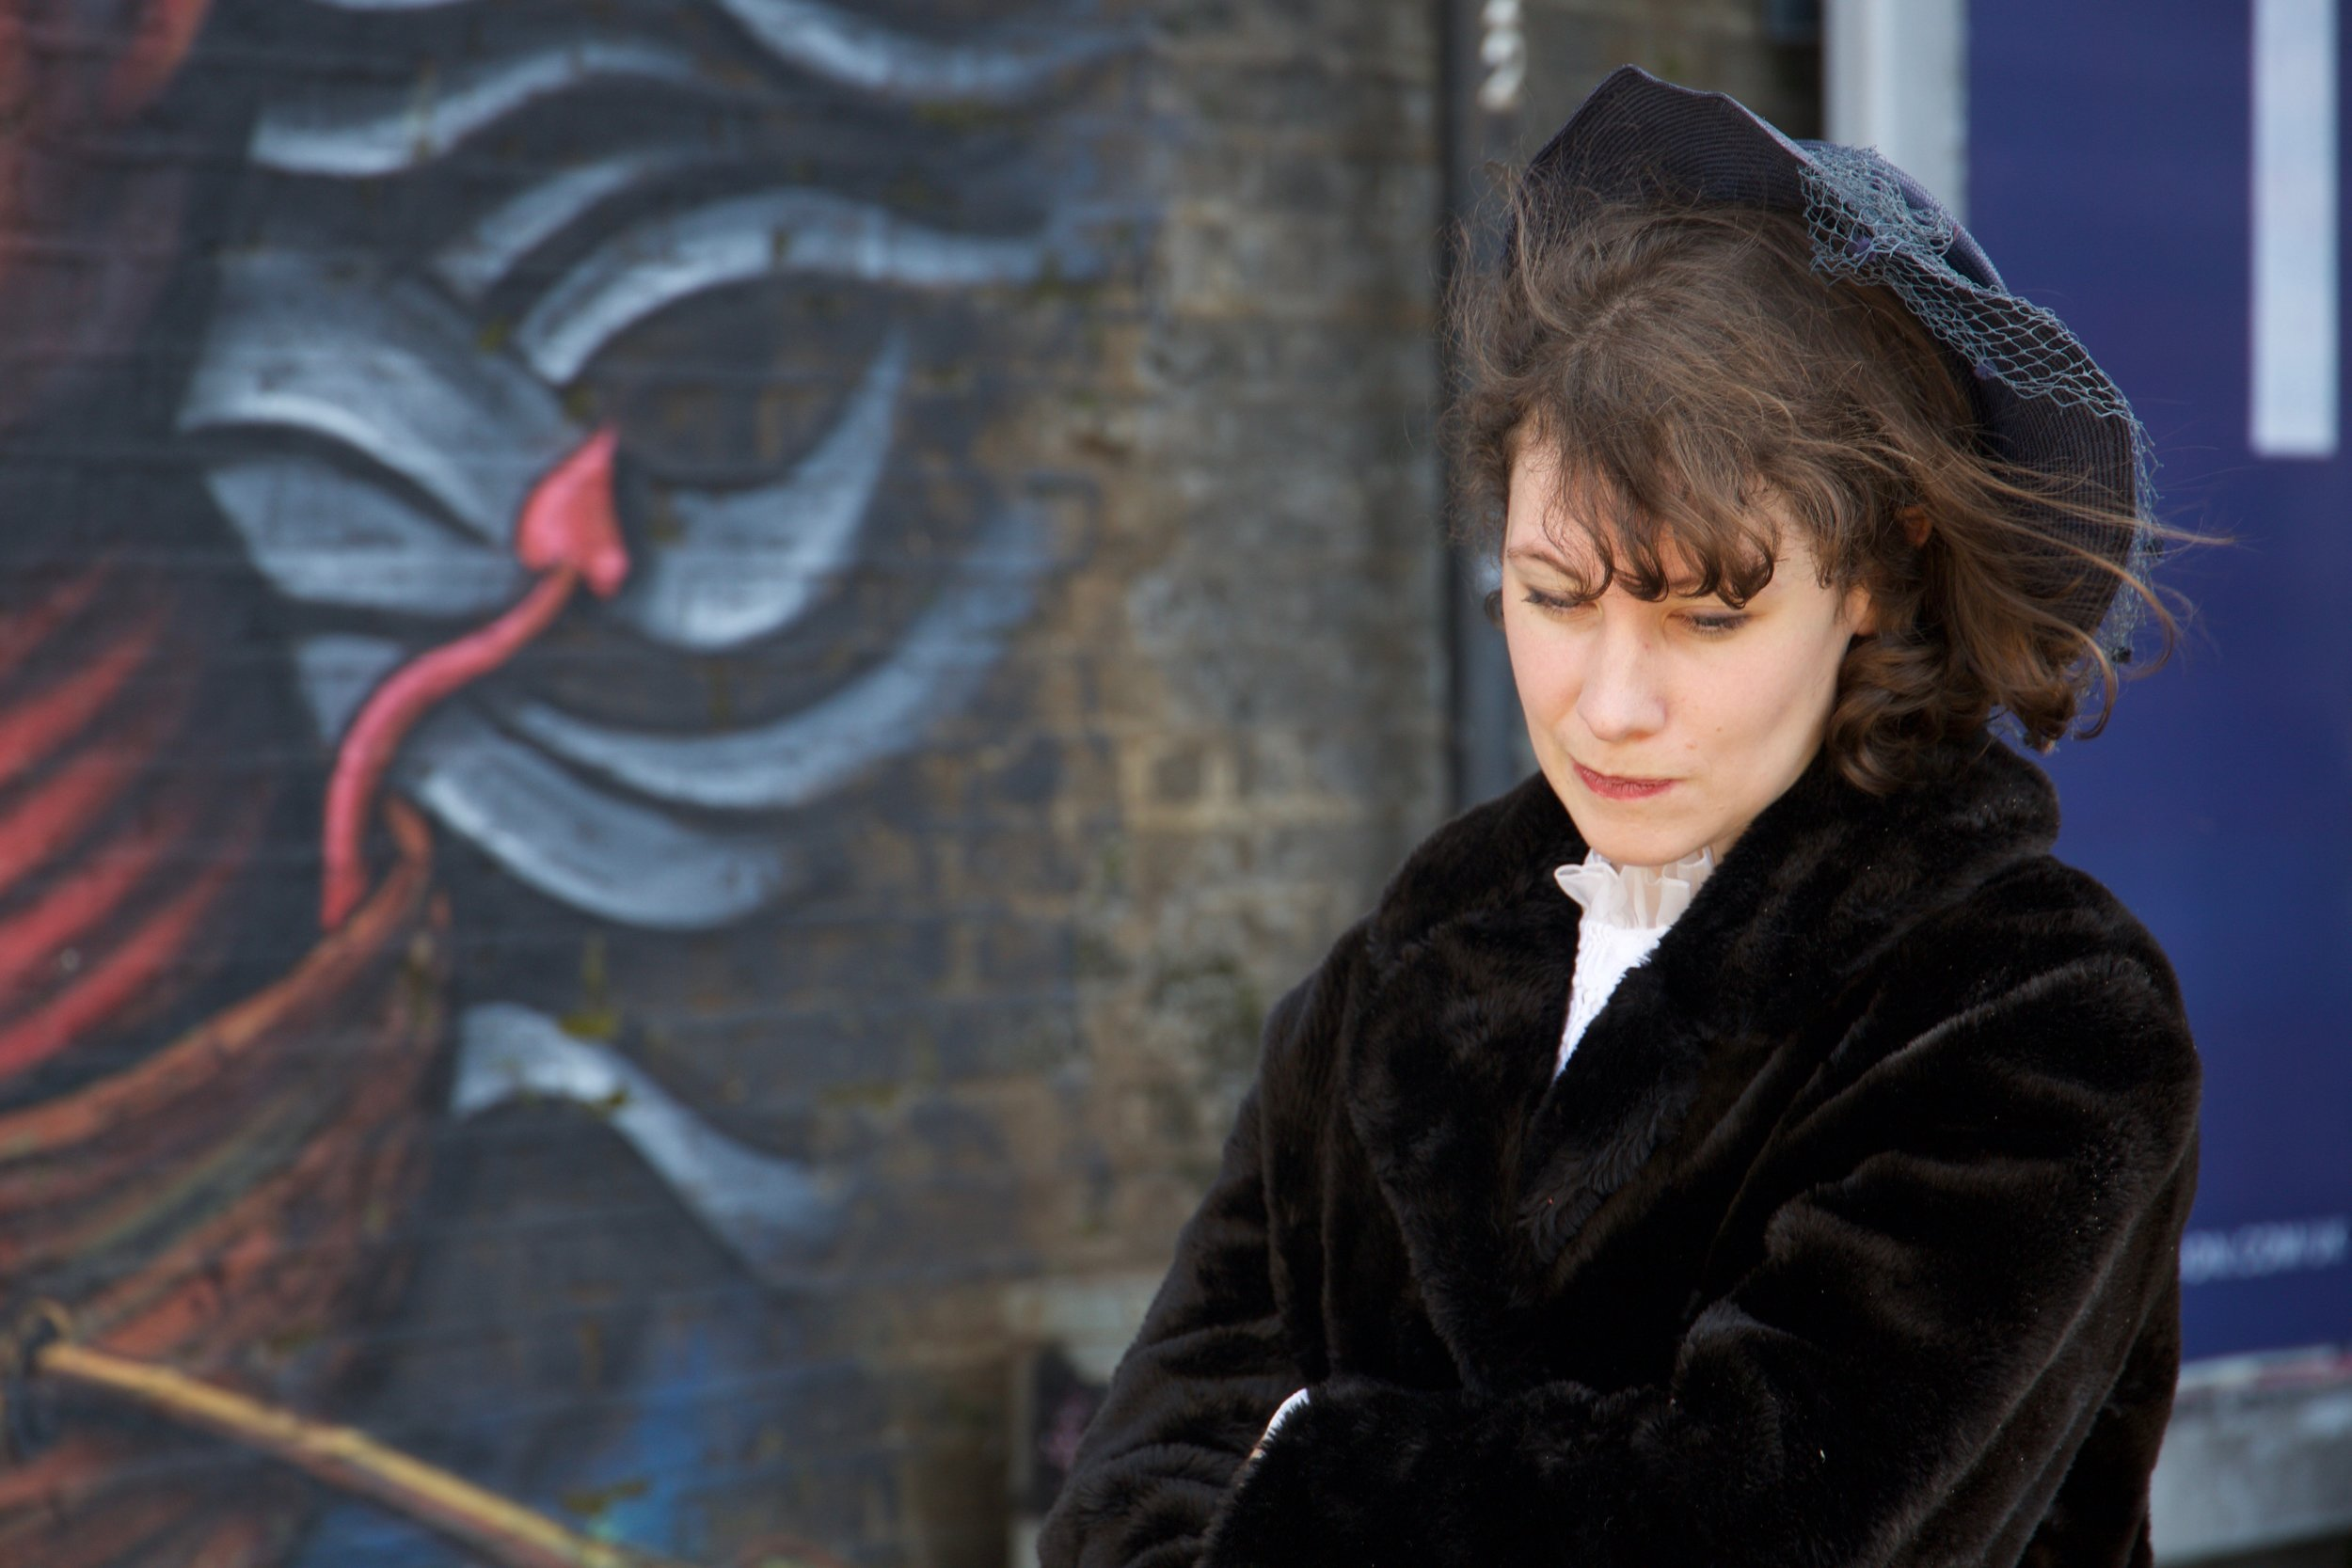 Copy of Stefania Ghasel Ritz (performer)